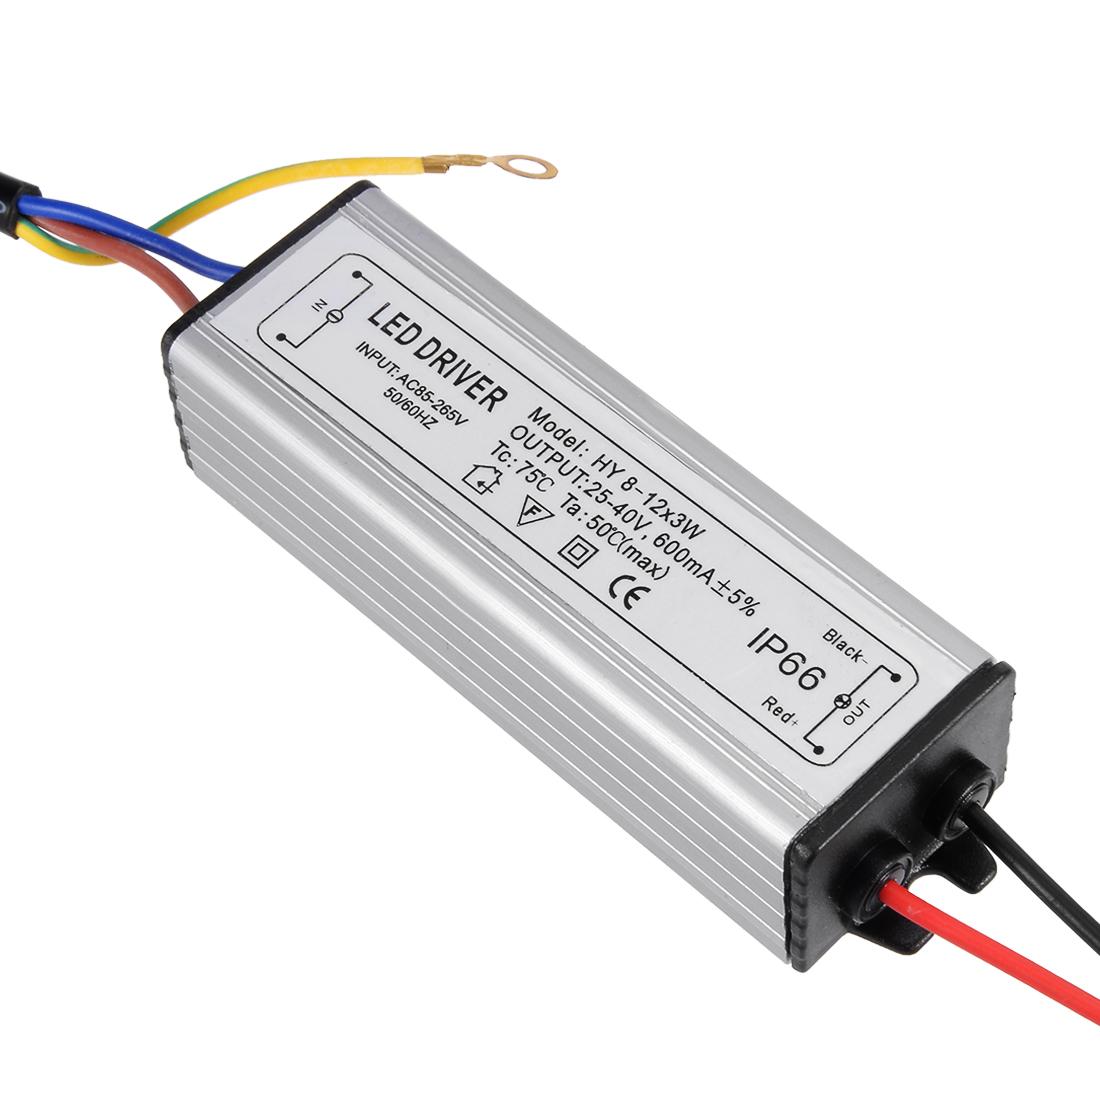 AC 85-265V to DC 25-40V 600mA IP66 8-12x3W LED Lightstrip Power Supply Driver